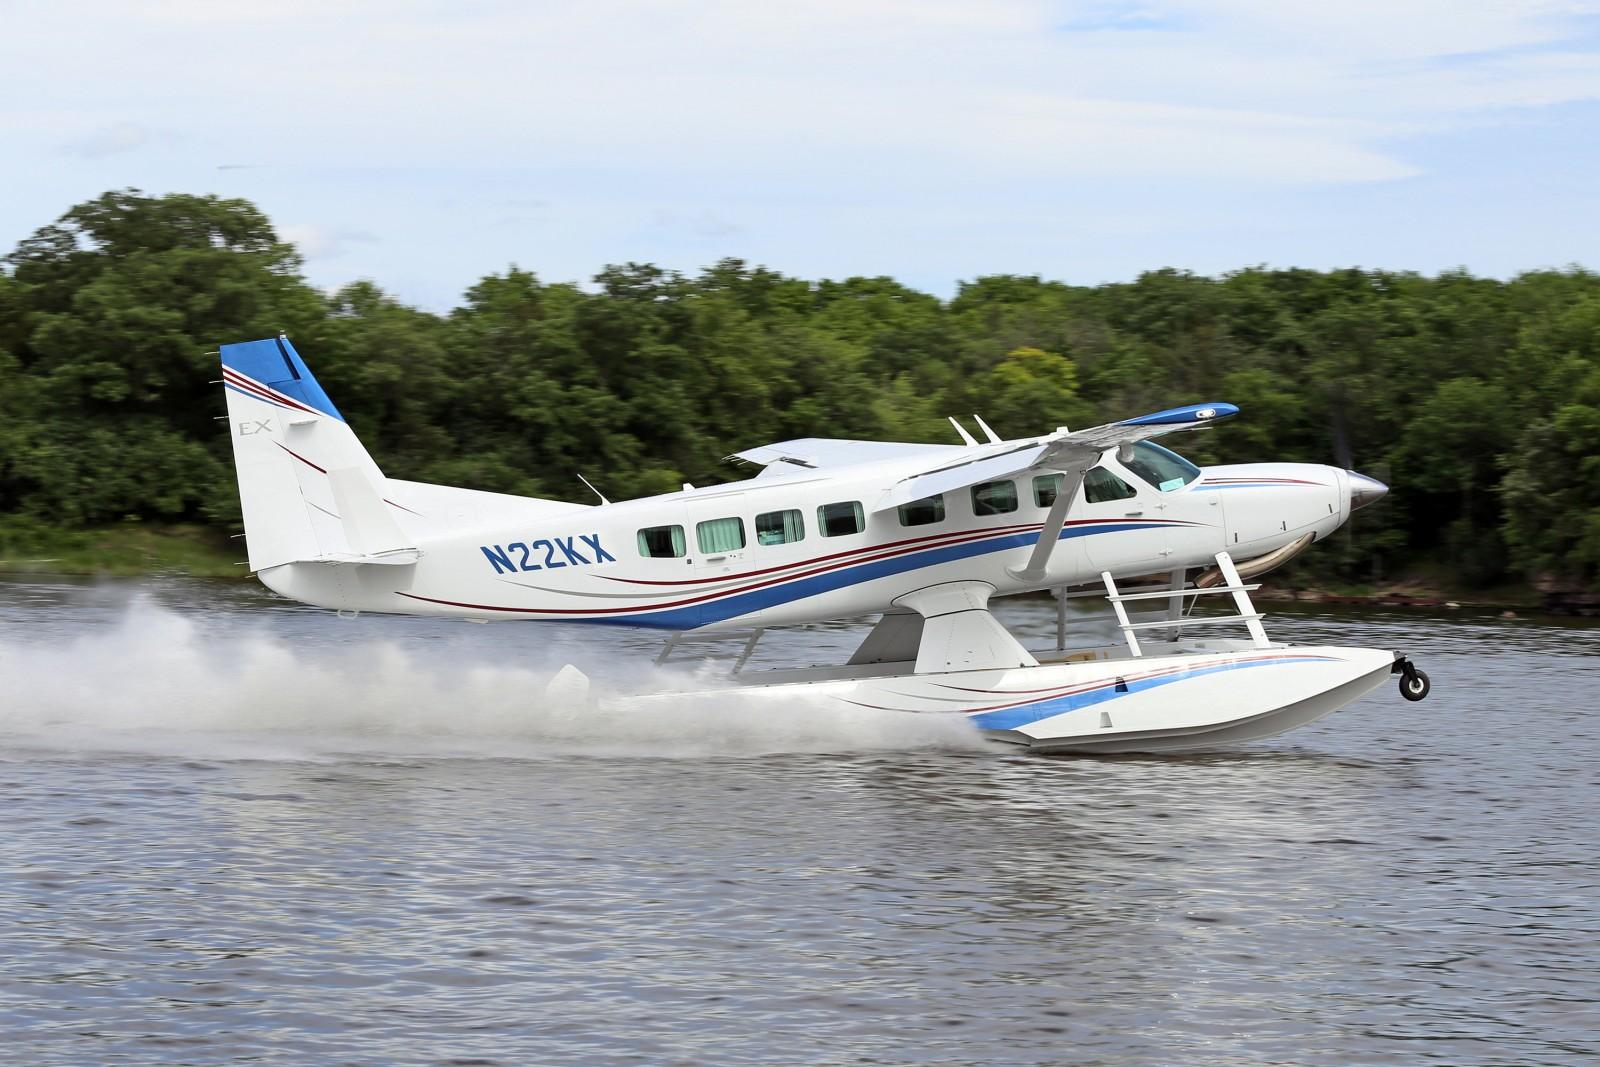 Image of a Cessna Grand Caravan on Wipline 8750 Floats